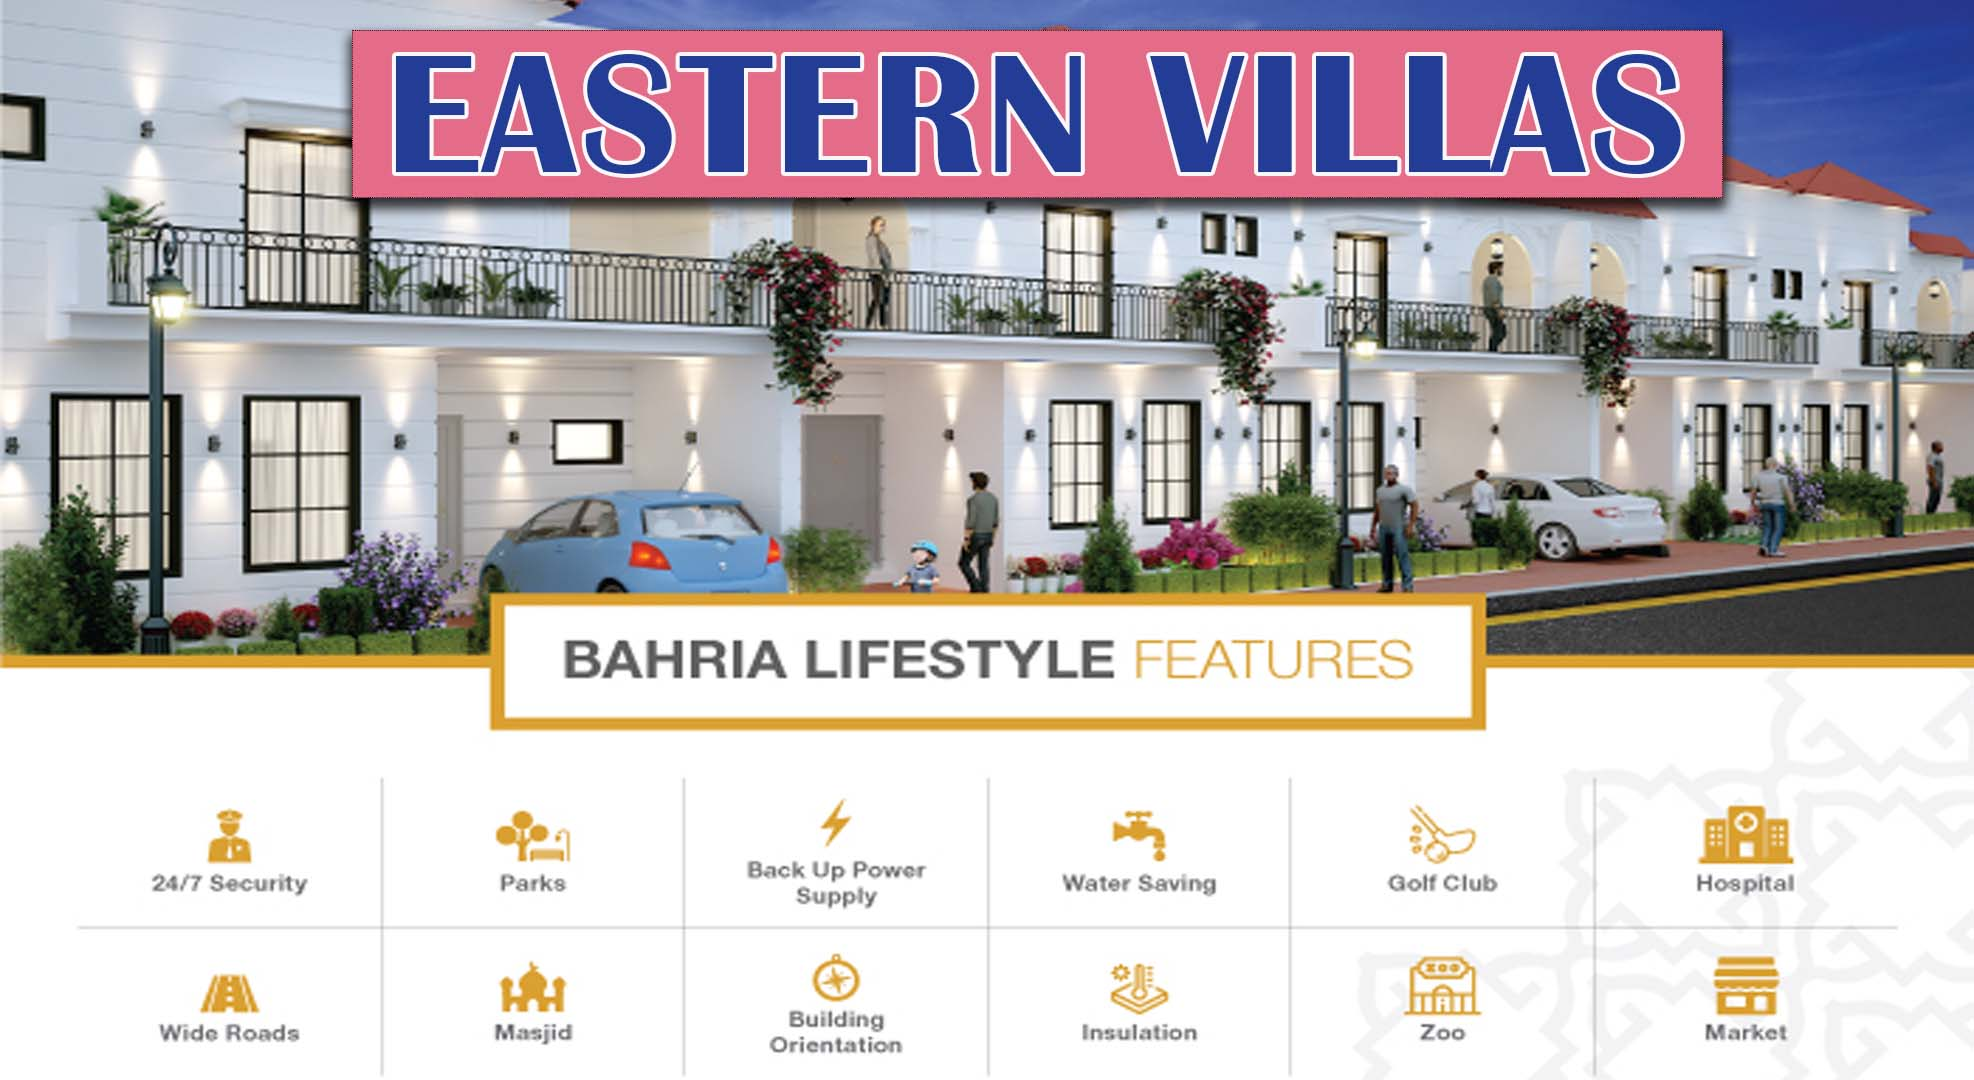 Eastern Villas